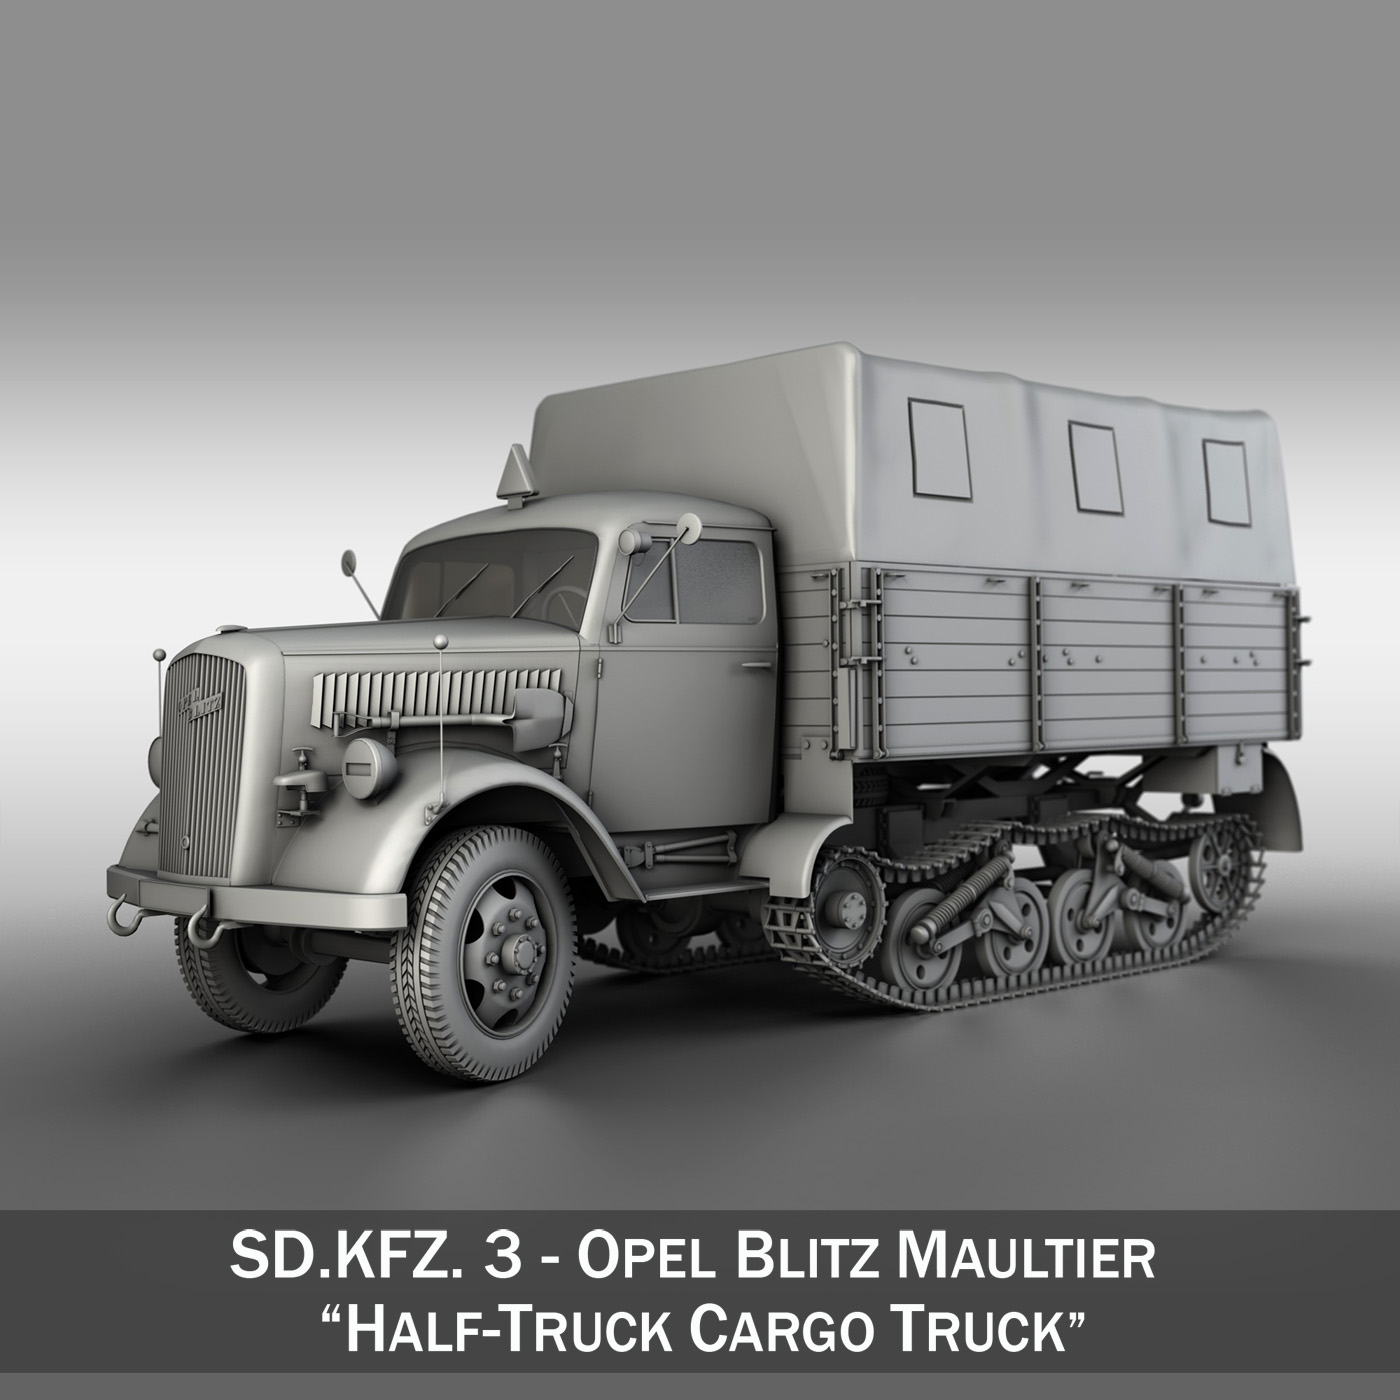 opel blitz maultier – half-truck cargo truck 3d model 3ds fbx c4d lwo obj 269955